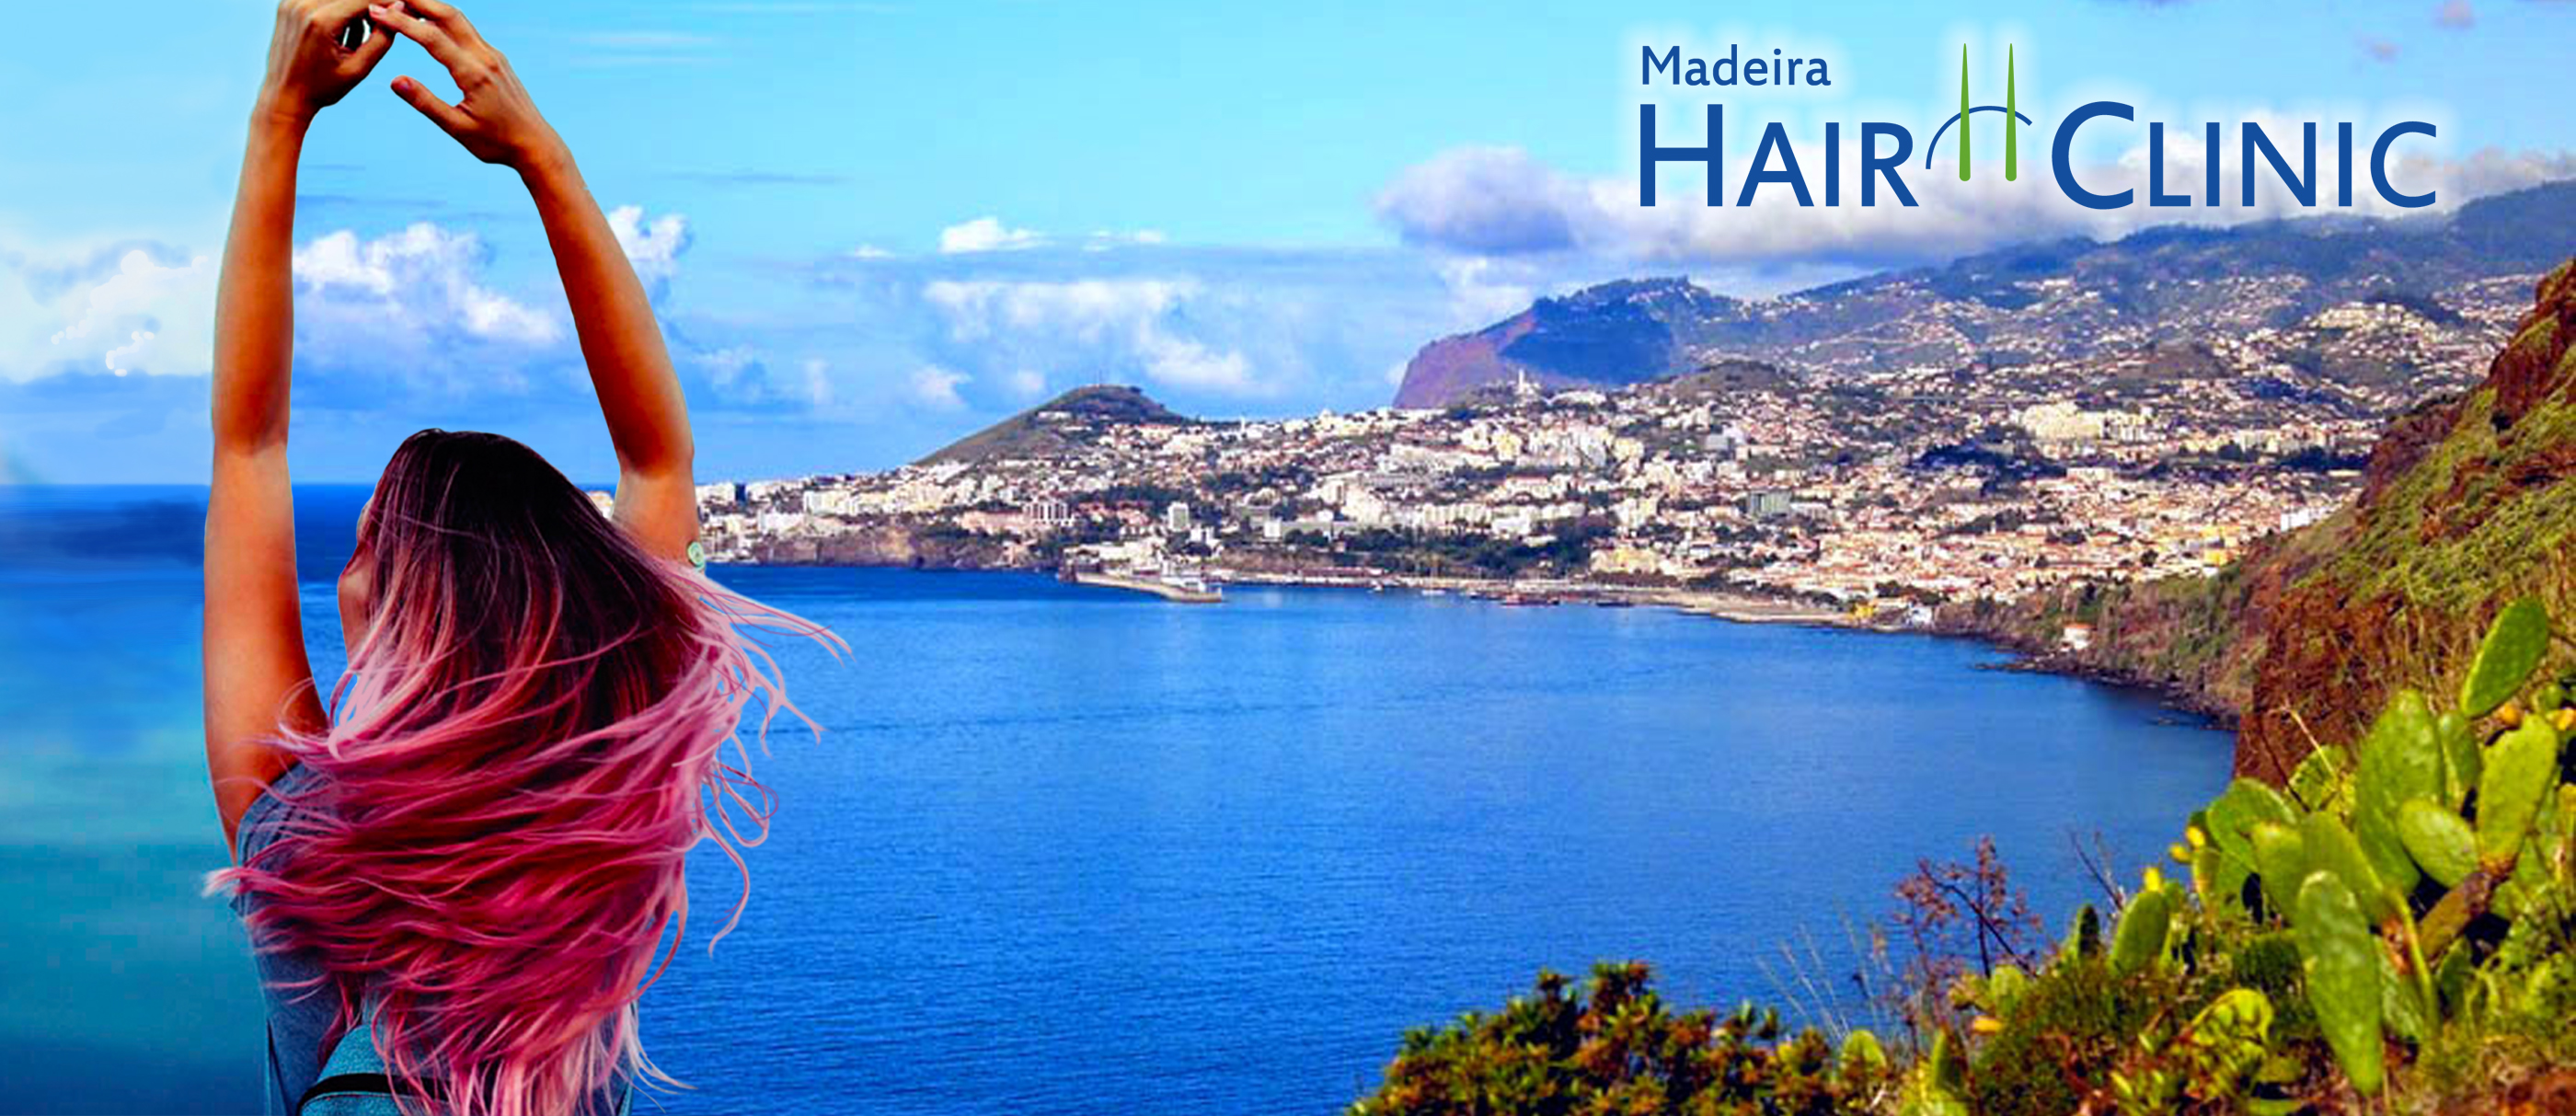 Madeira Hiar Clinic, Funchal